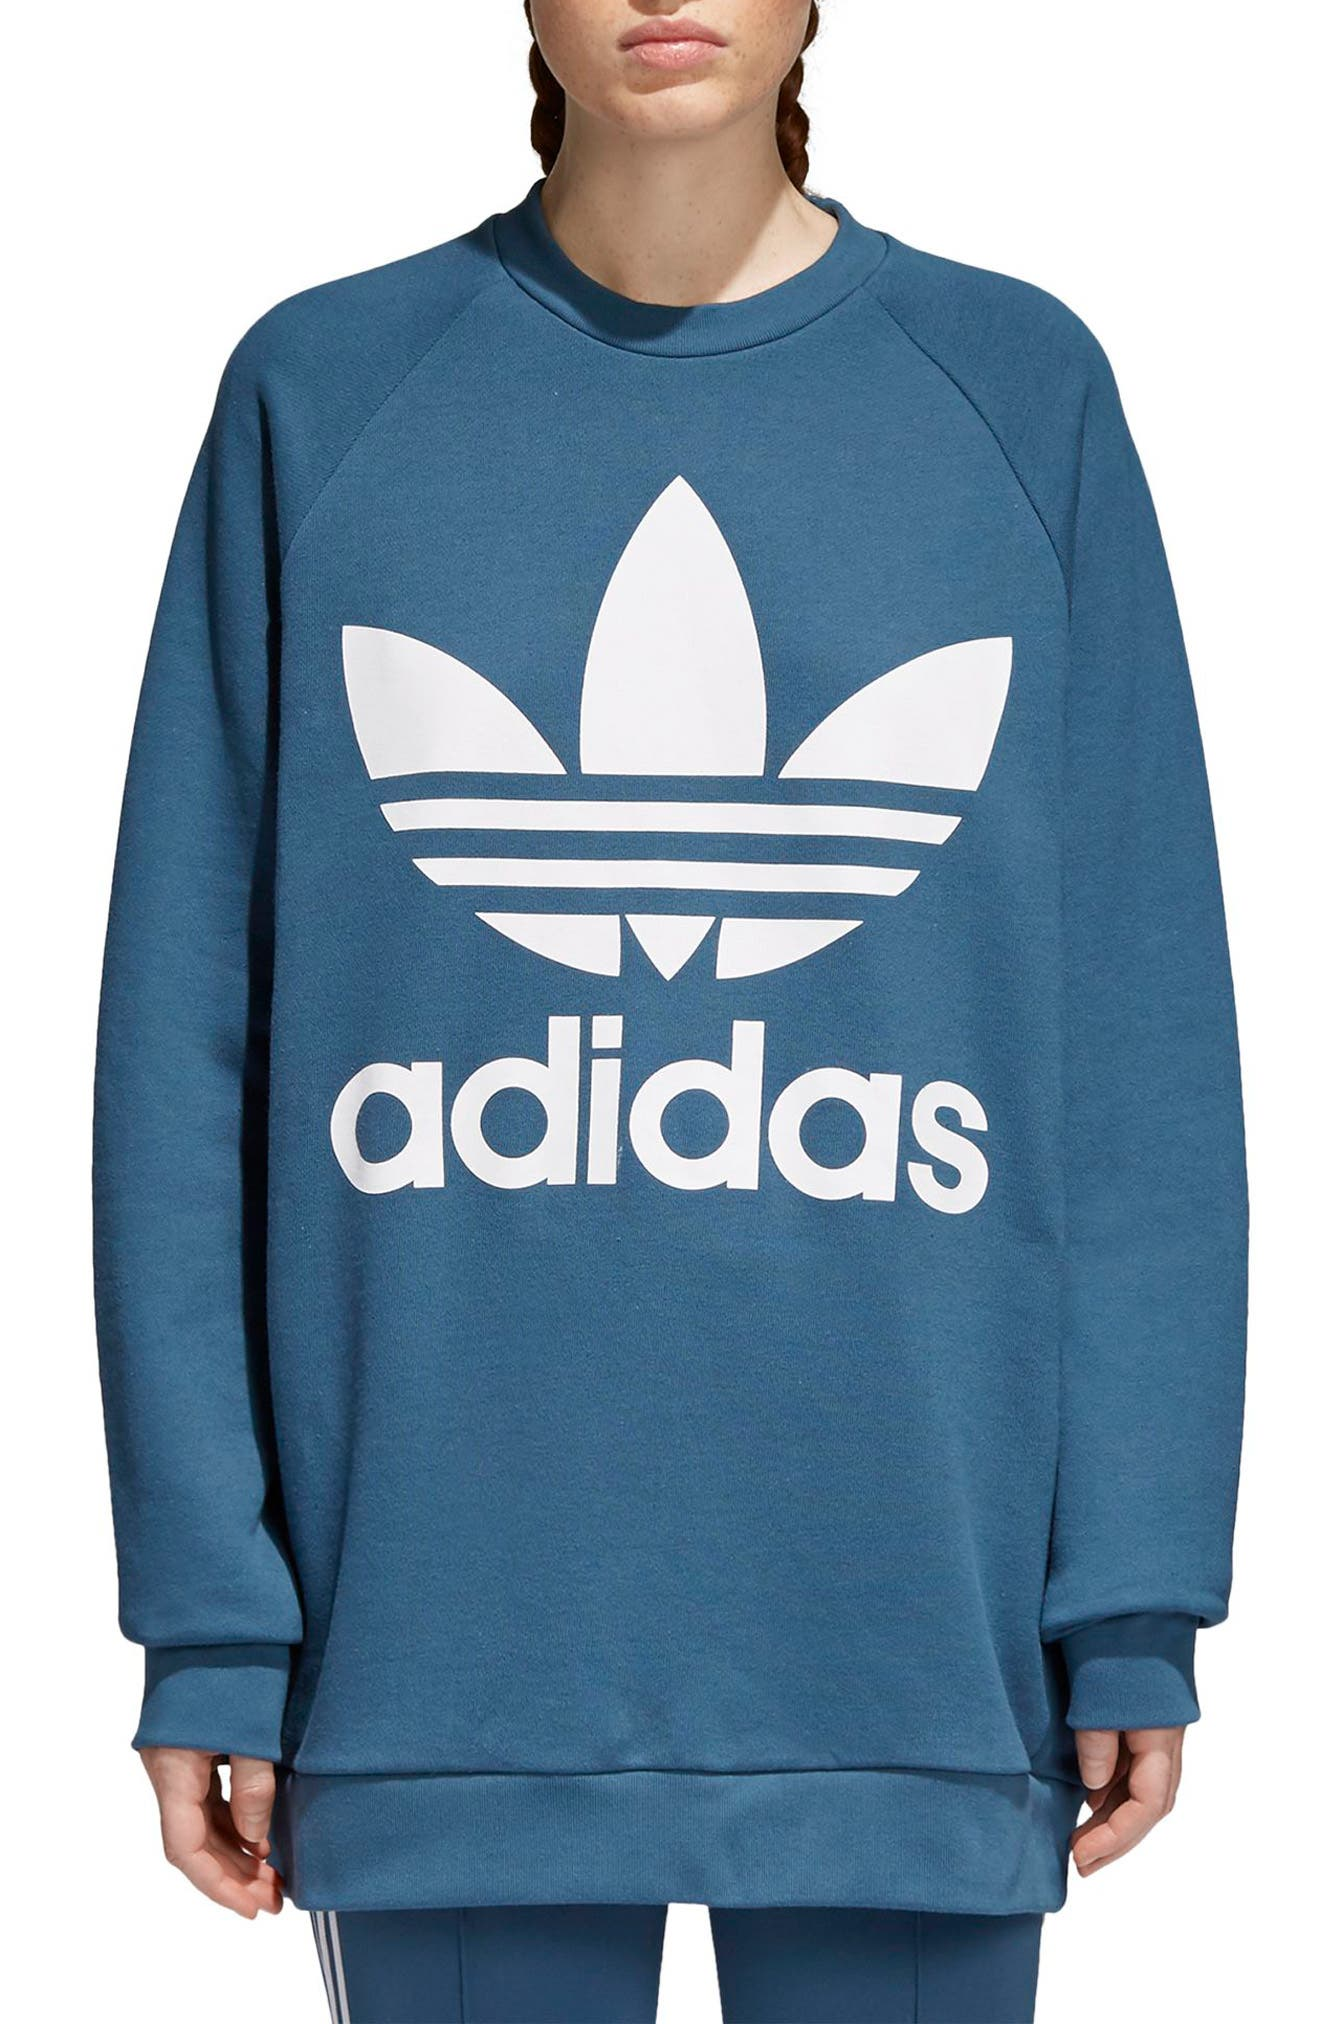 Originals Oversize Sweatshirt,                             Main thumbnail 1, color,                             020